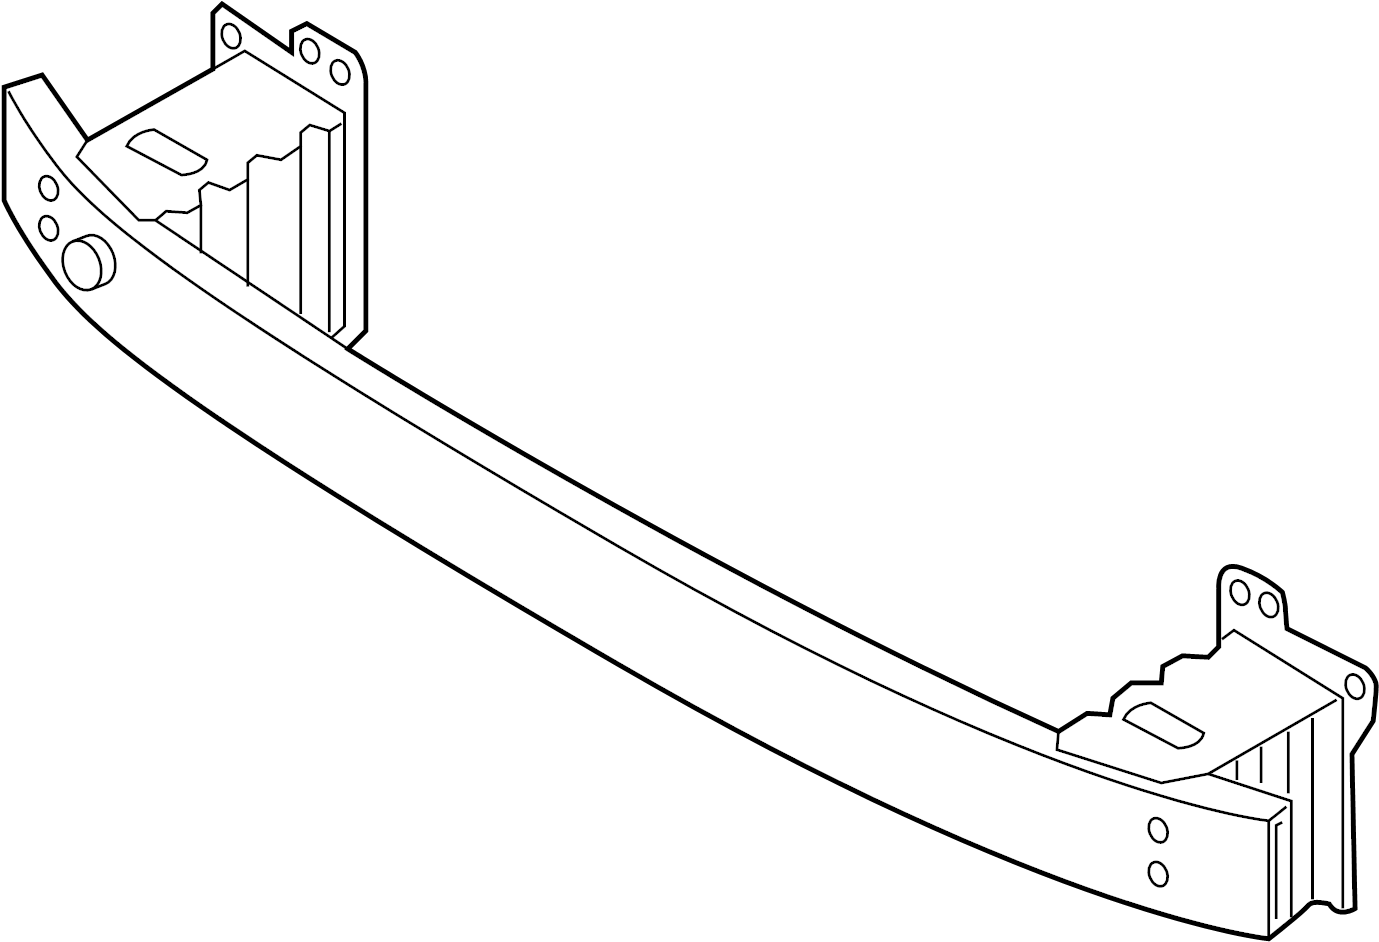 4h0807109c - bumper impact bar  2011-14  2015-18  impact bar  u0026 brackets